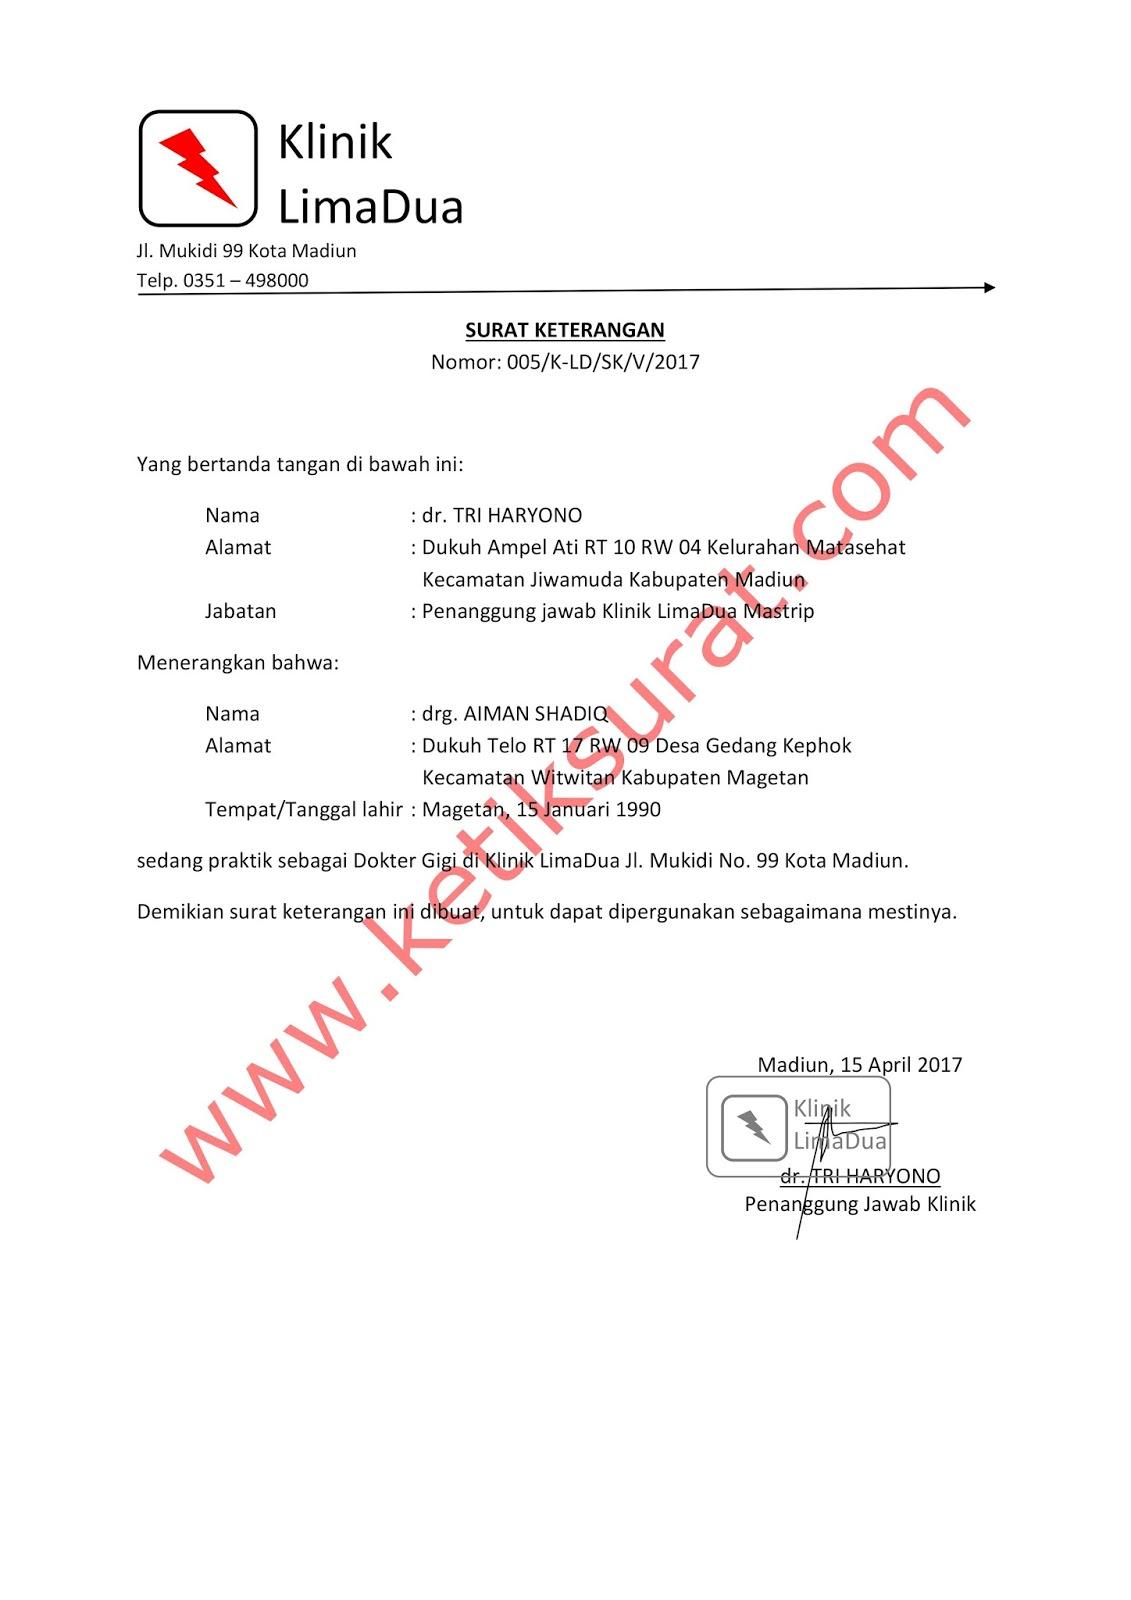 Contoh Surat Keterangan Praktik Dokter Di Klinik Ketik Surat